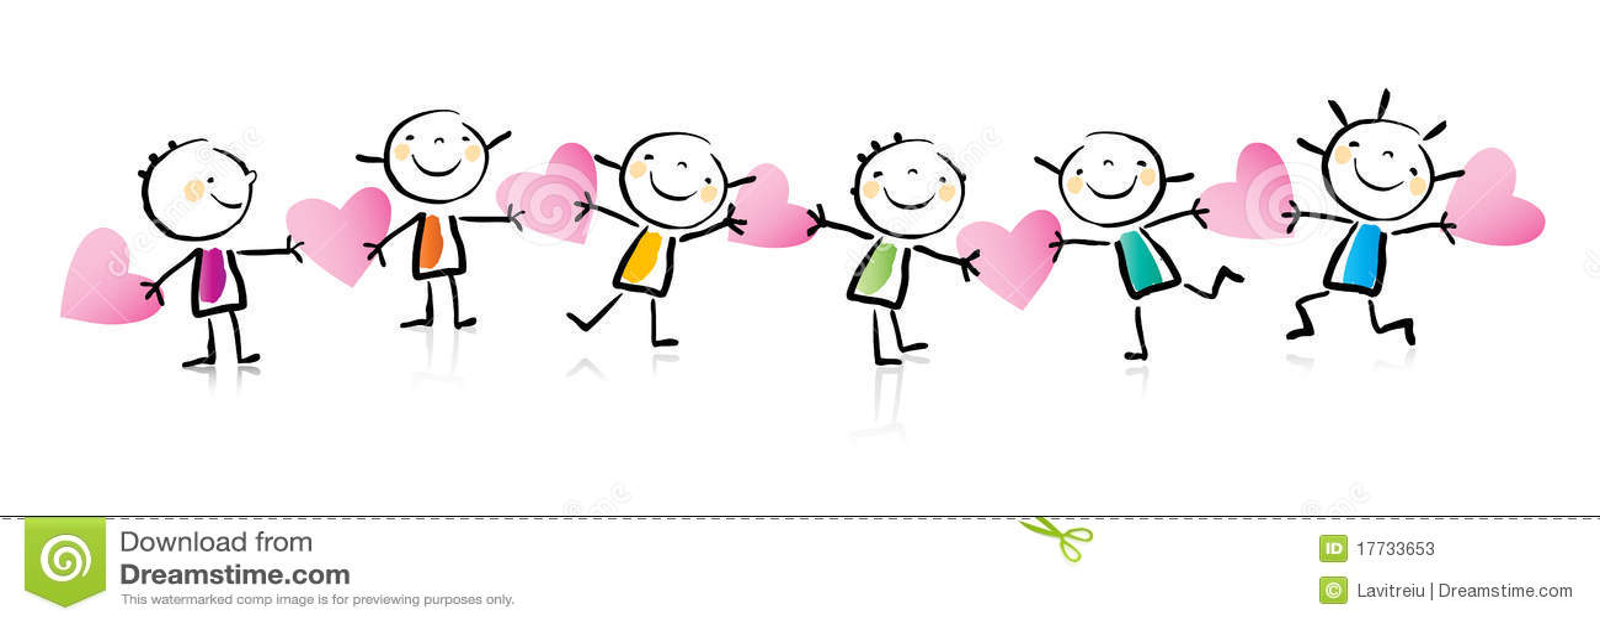 Valentine S Day Cartoon Stock Vector Illustration Of Line 17733653